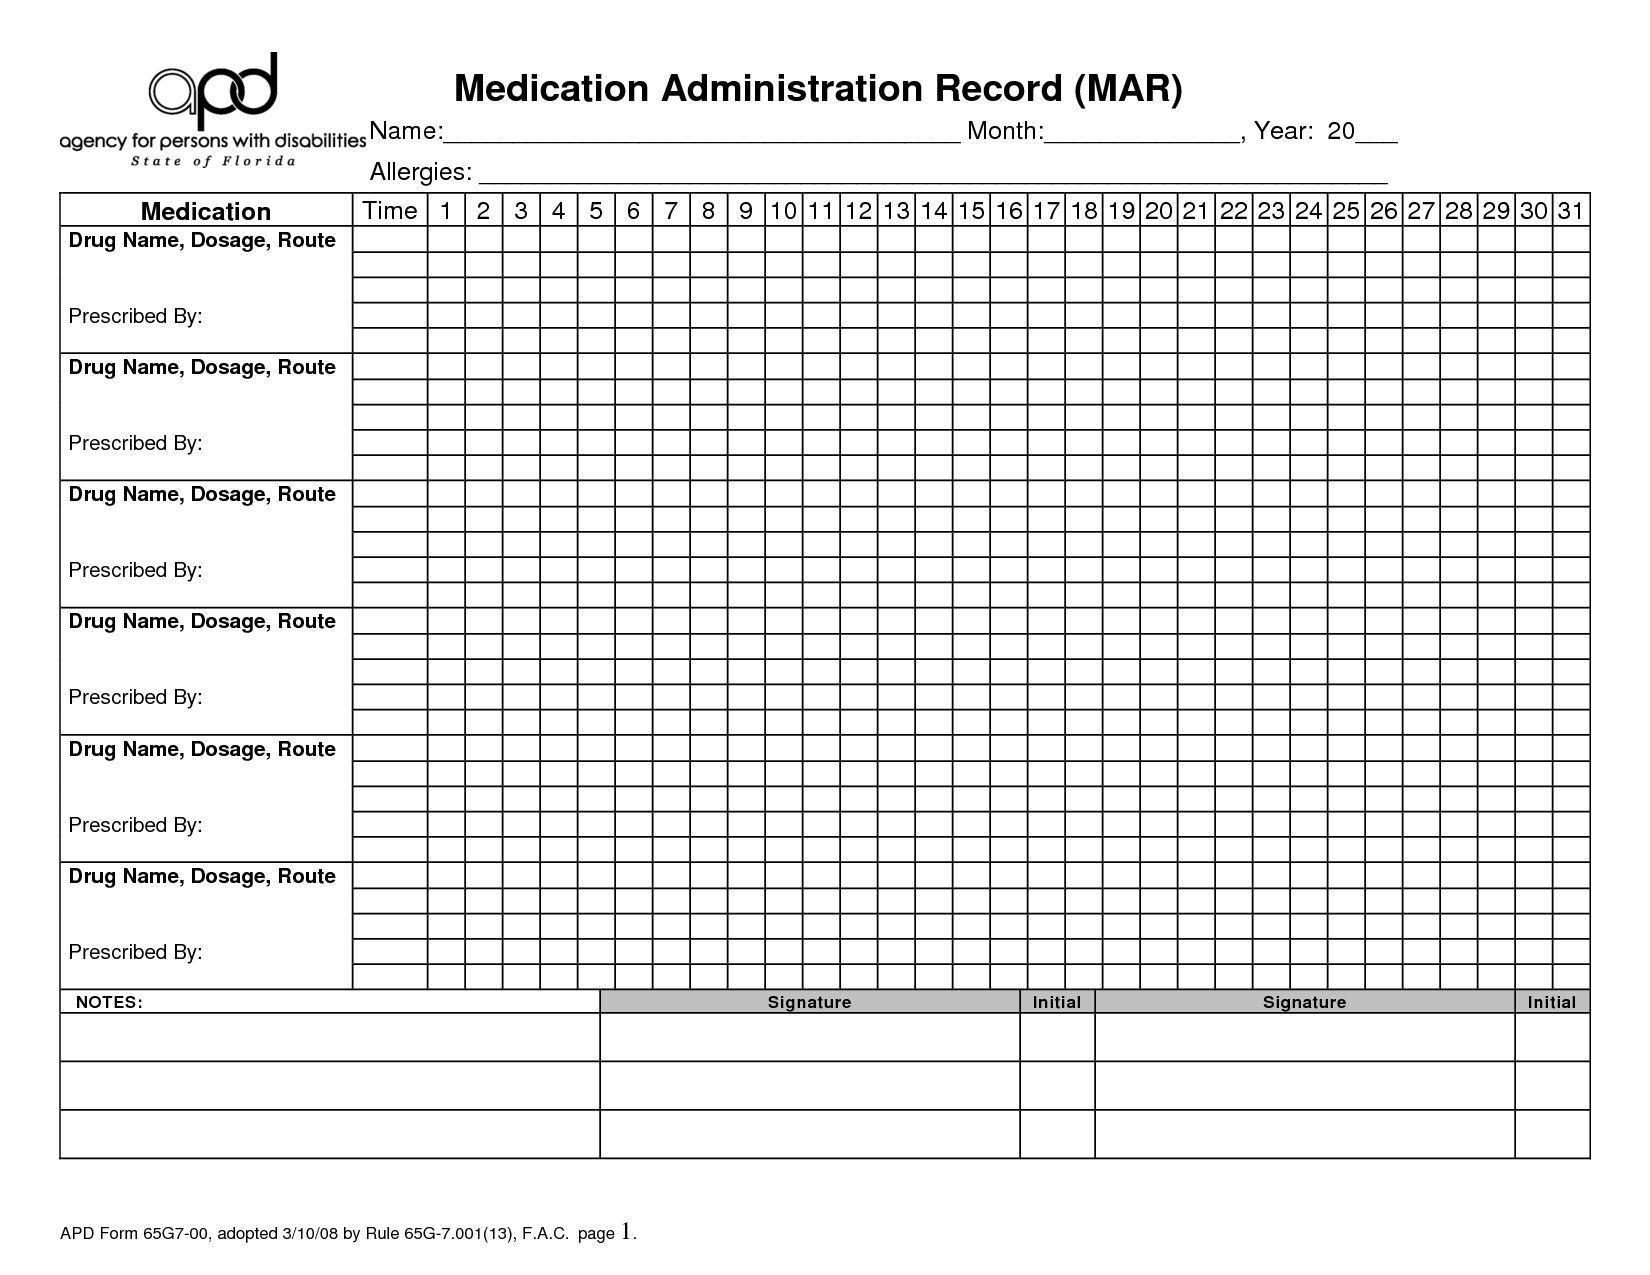 Effective 28 Day Medication Calender In 2020 | Medication